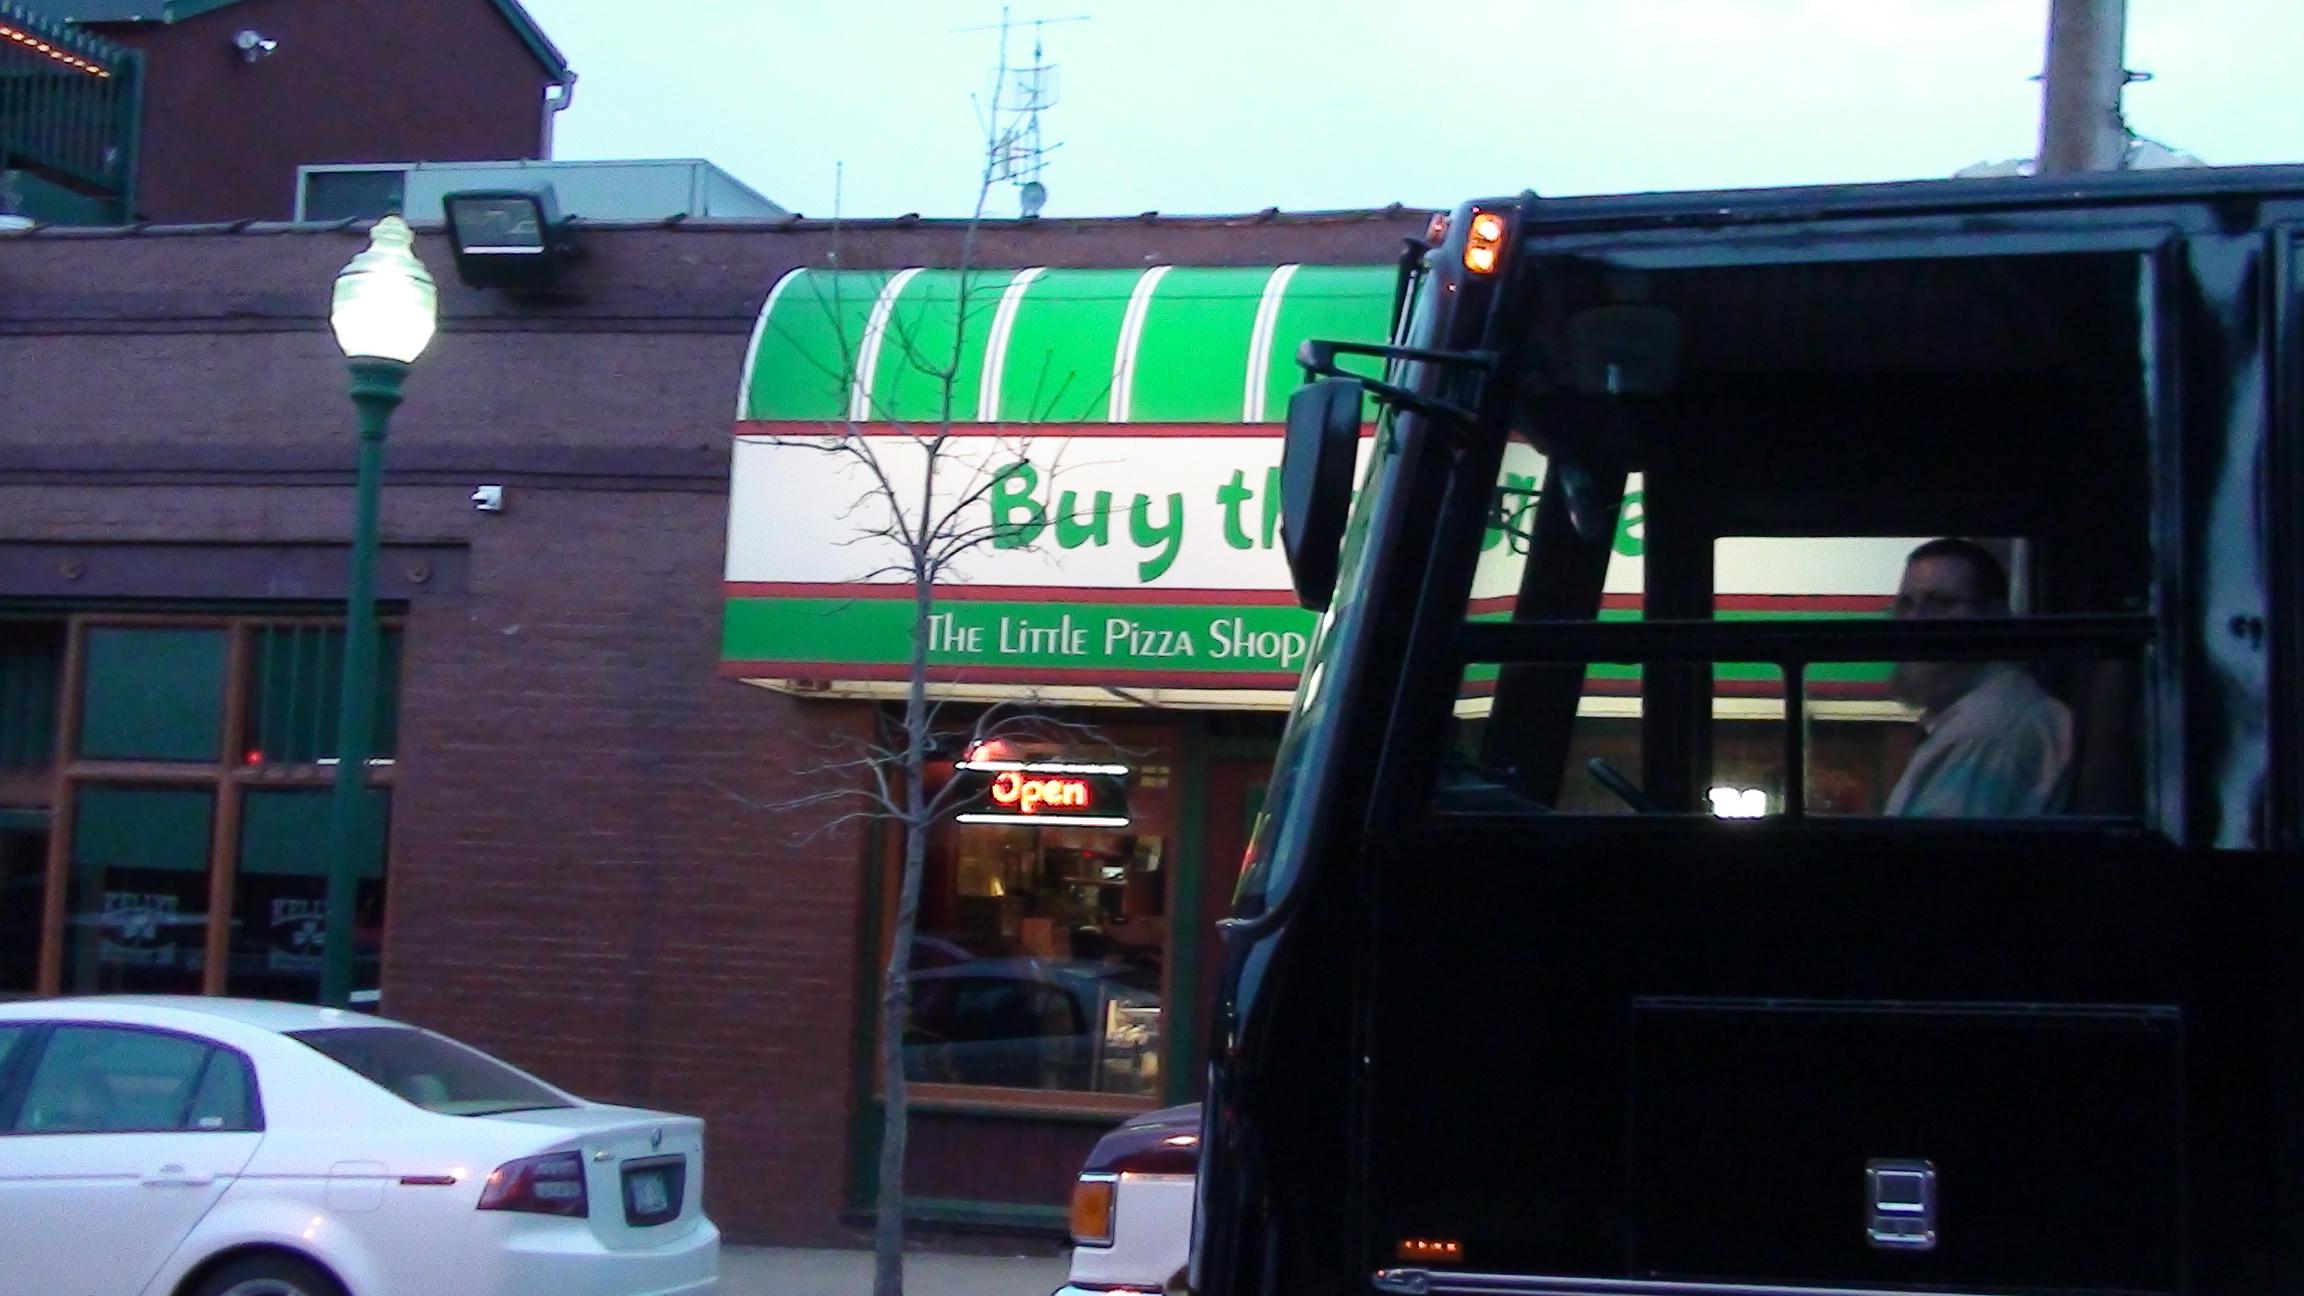 Black VIP Party Bus in front of Joe's Pizza in Westport